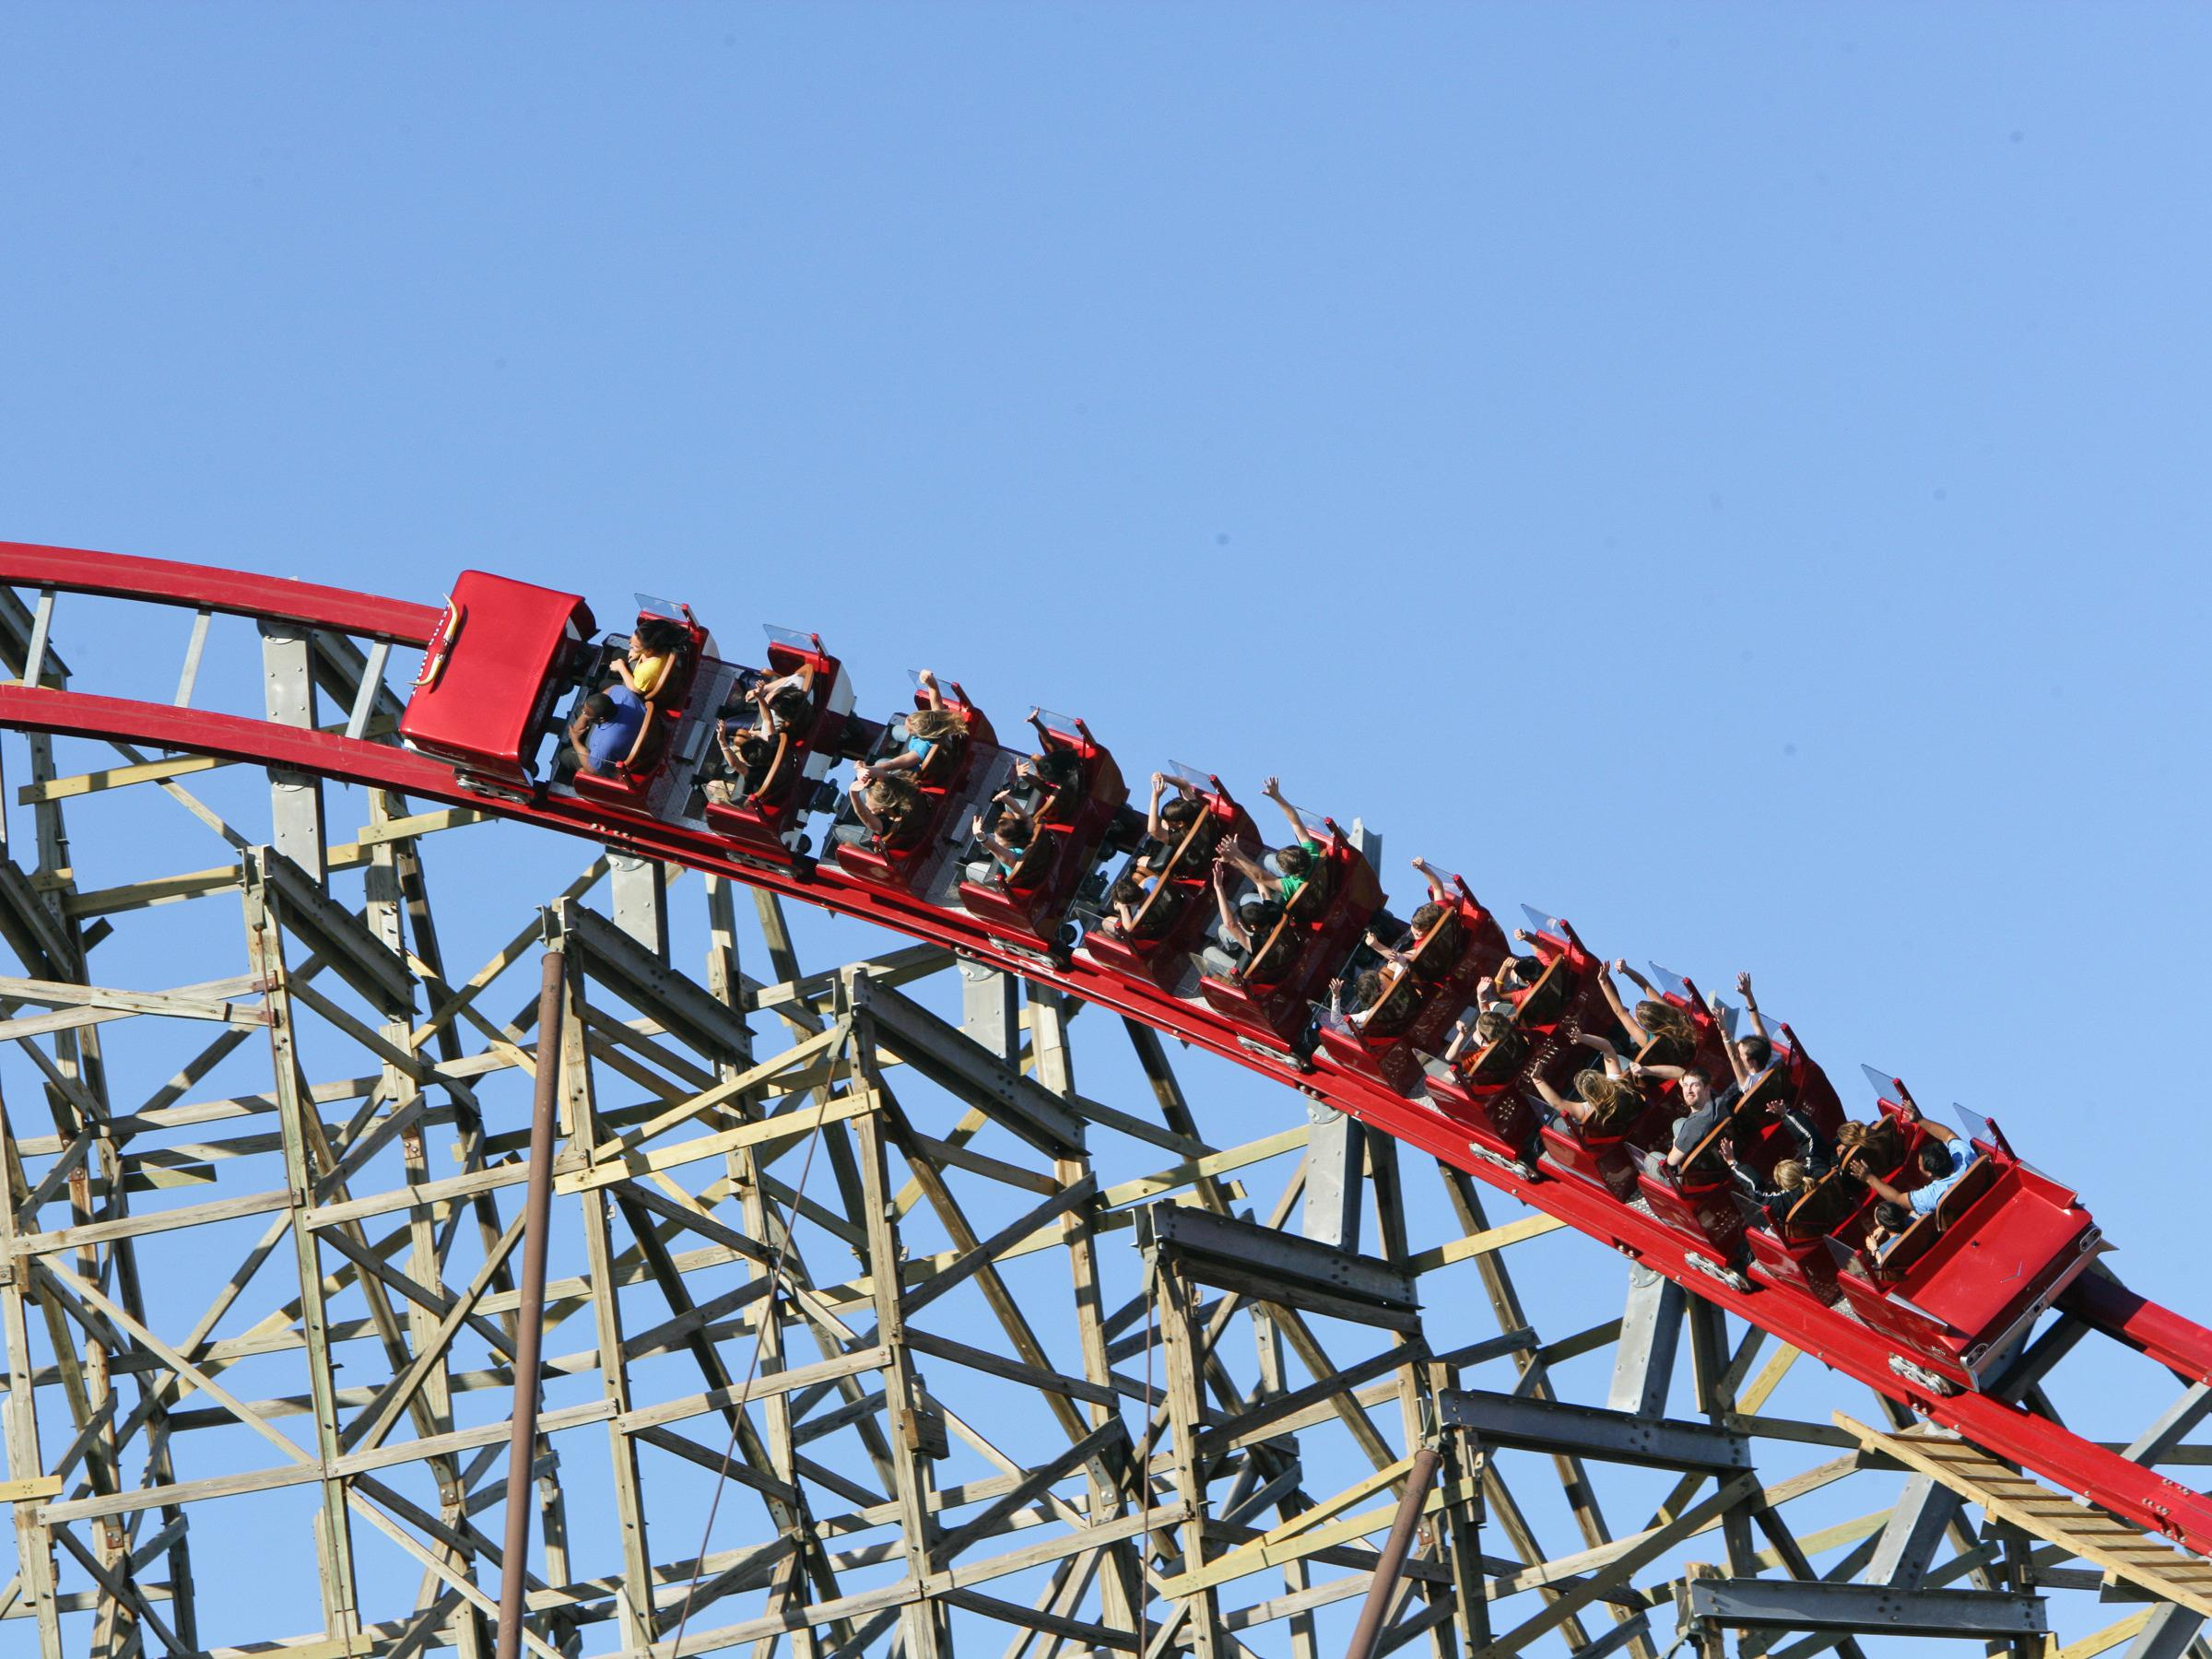 Image: Texas Giant roller coaster